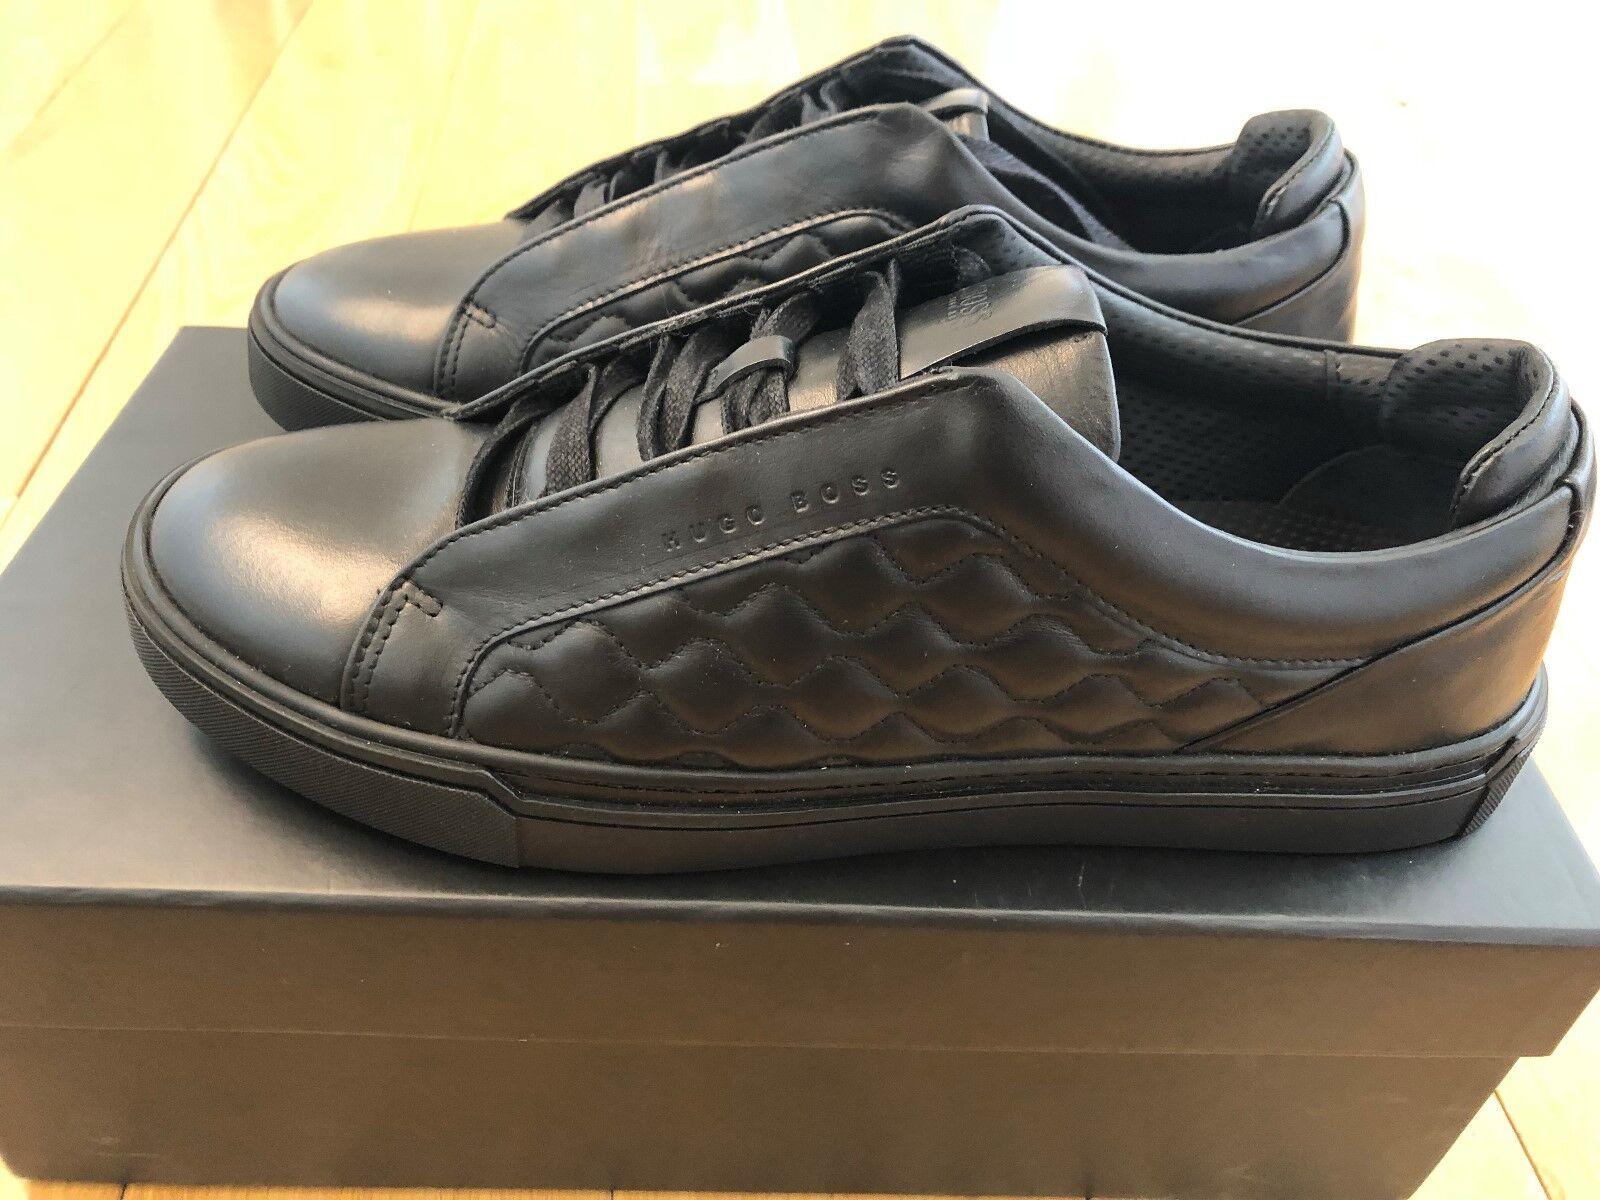 6060955e4589 100% Authentic Hugo Boss Men s Calf Leather Trainers US 9 rrp 320. Christian  Louboutin ...